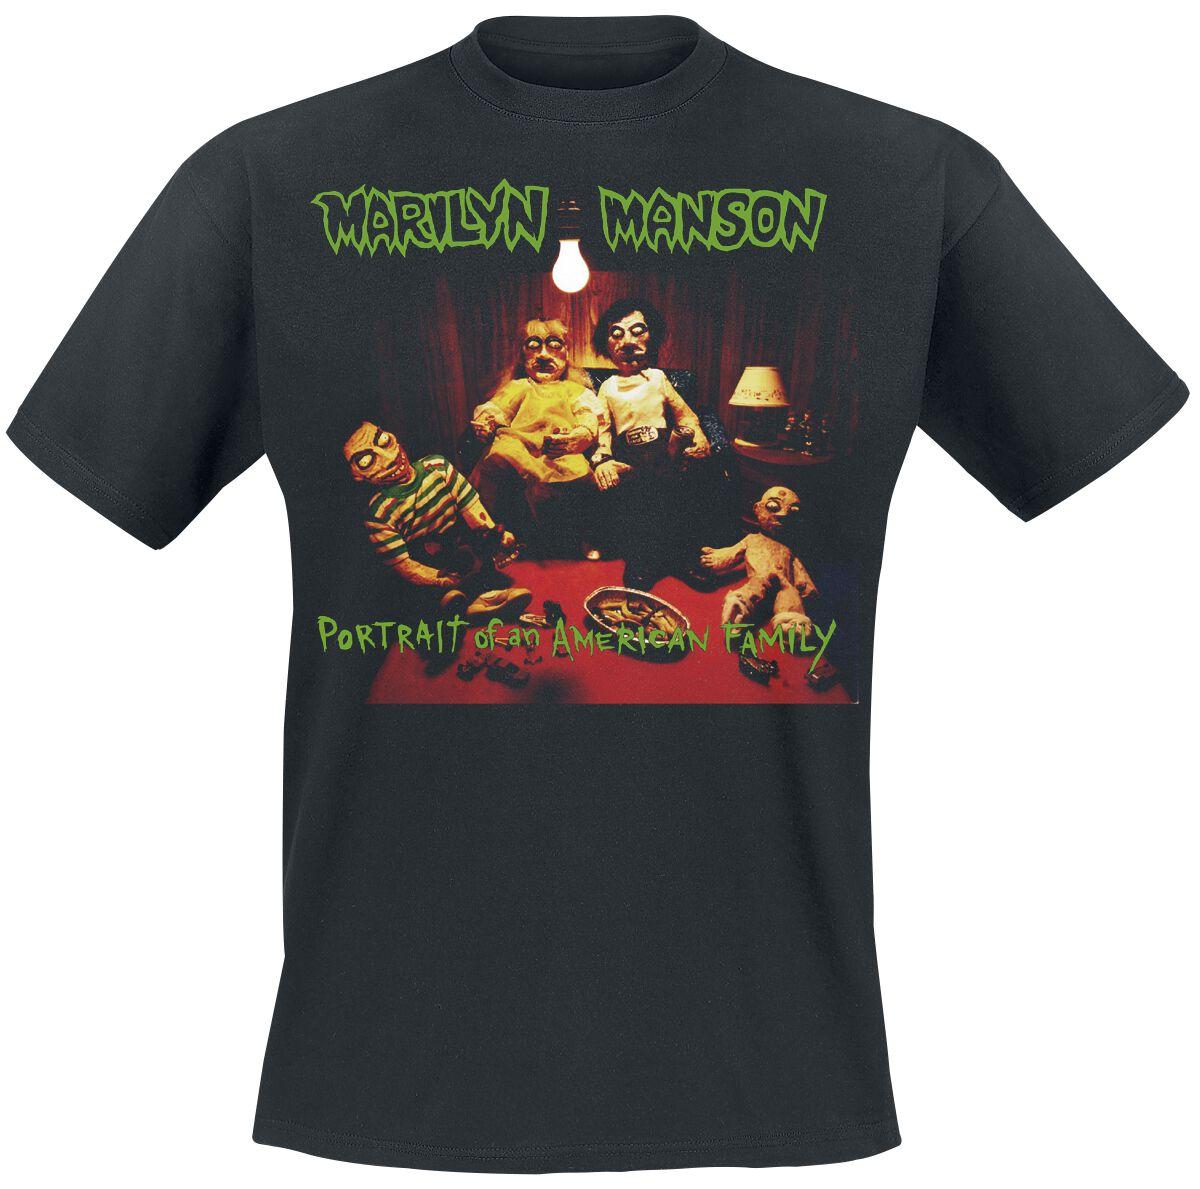 Zespoły - Koszulki - T-Shirt Marilyn Manson American Family T-Shirt czarny - 367644